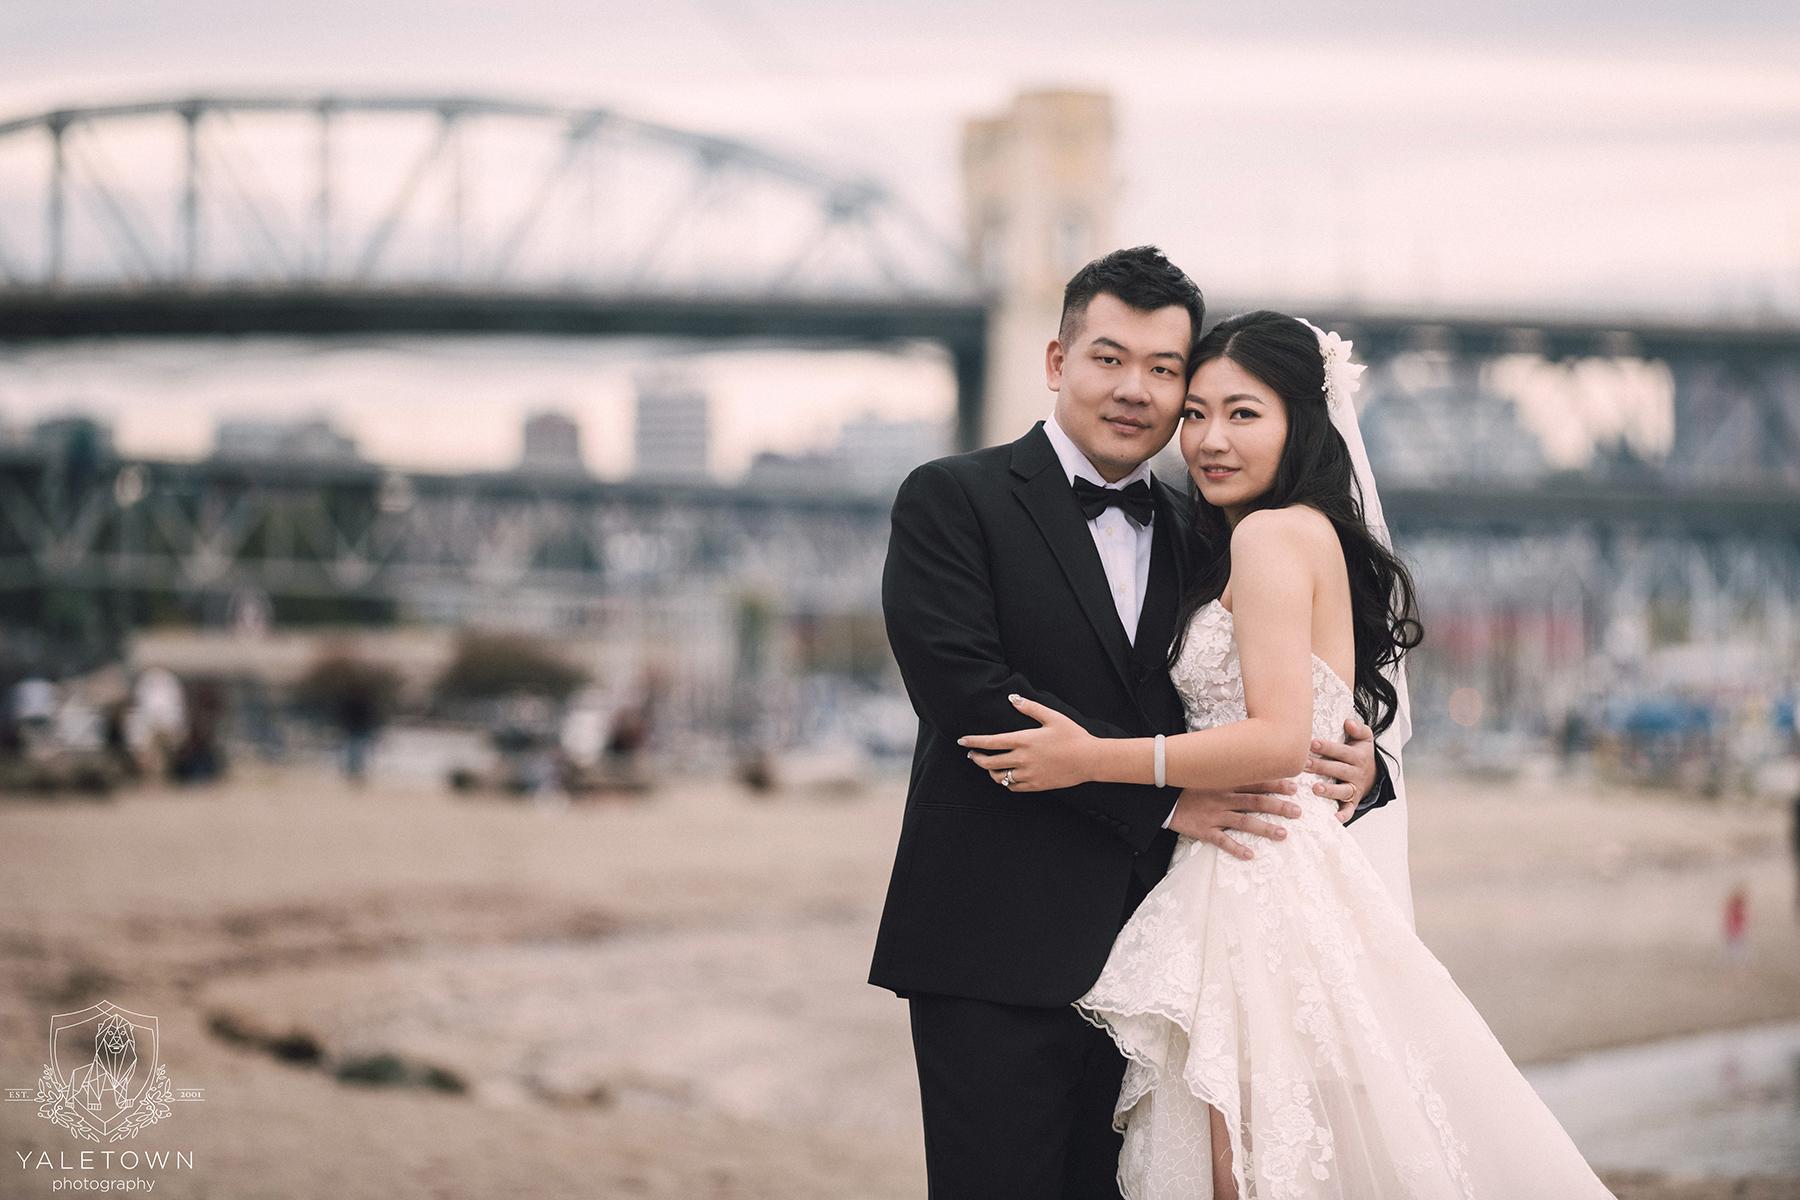 Sunset-Beach-Burrard-Bridge-Bride-Groom-Rosewood-Hotel-Georgia-Vancouver-Wedding-Yaletown-Photography-photo